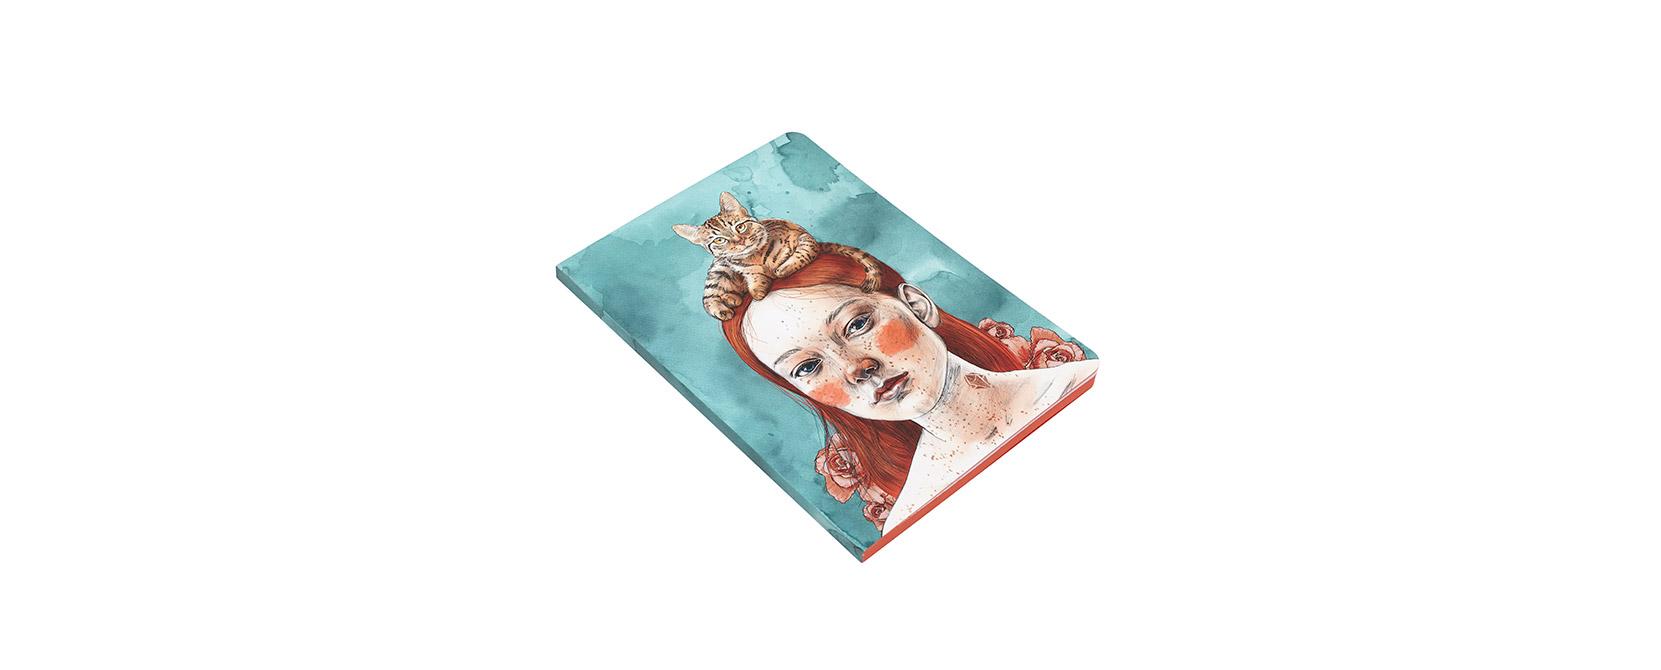 Cuaderno ilustrado Nise - Reina de Diamantes